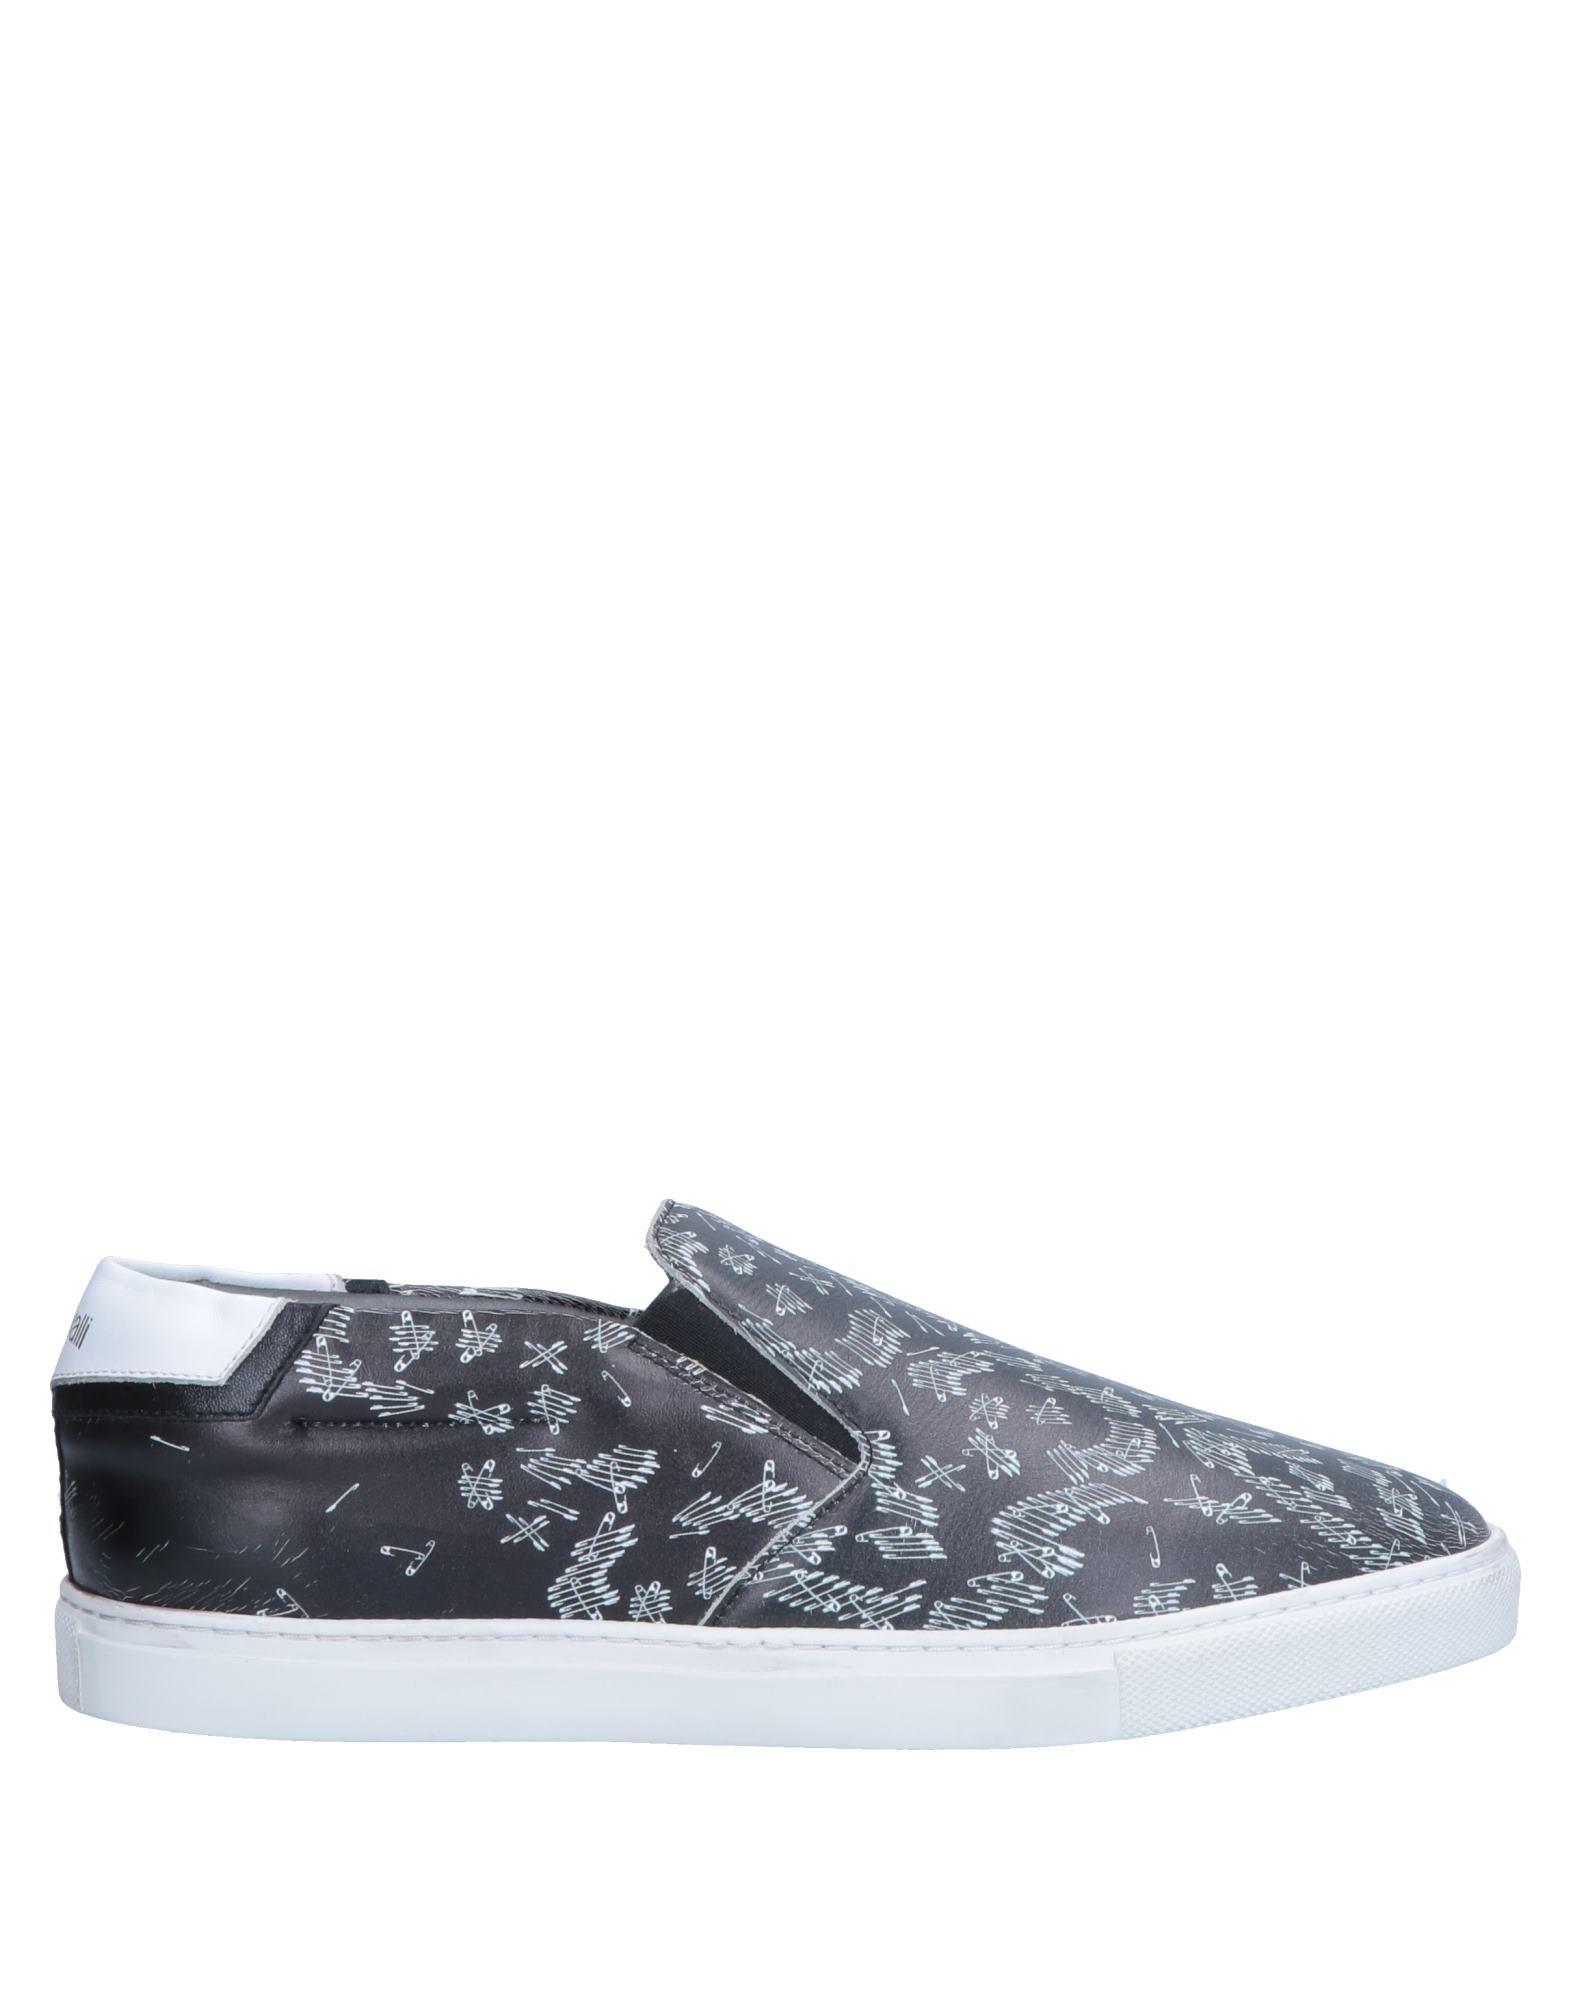 Just Cavalli Sneakers Herren  11560110HH Gute Qualität beliebte Schuhe